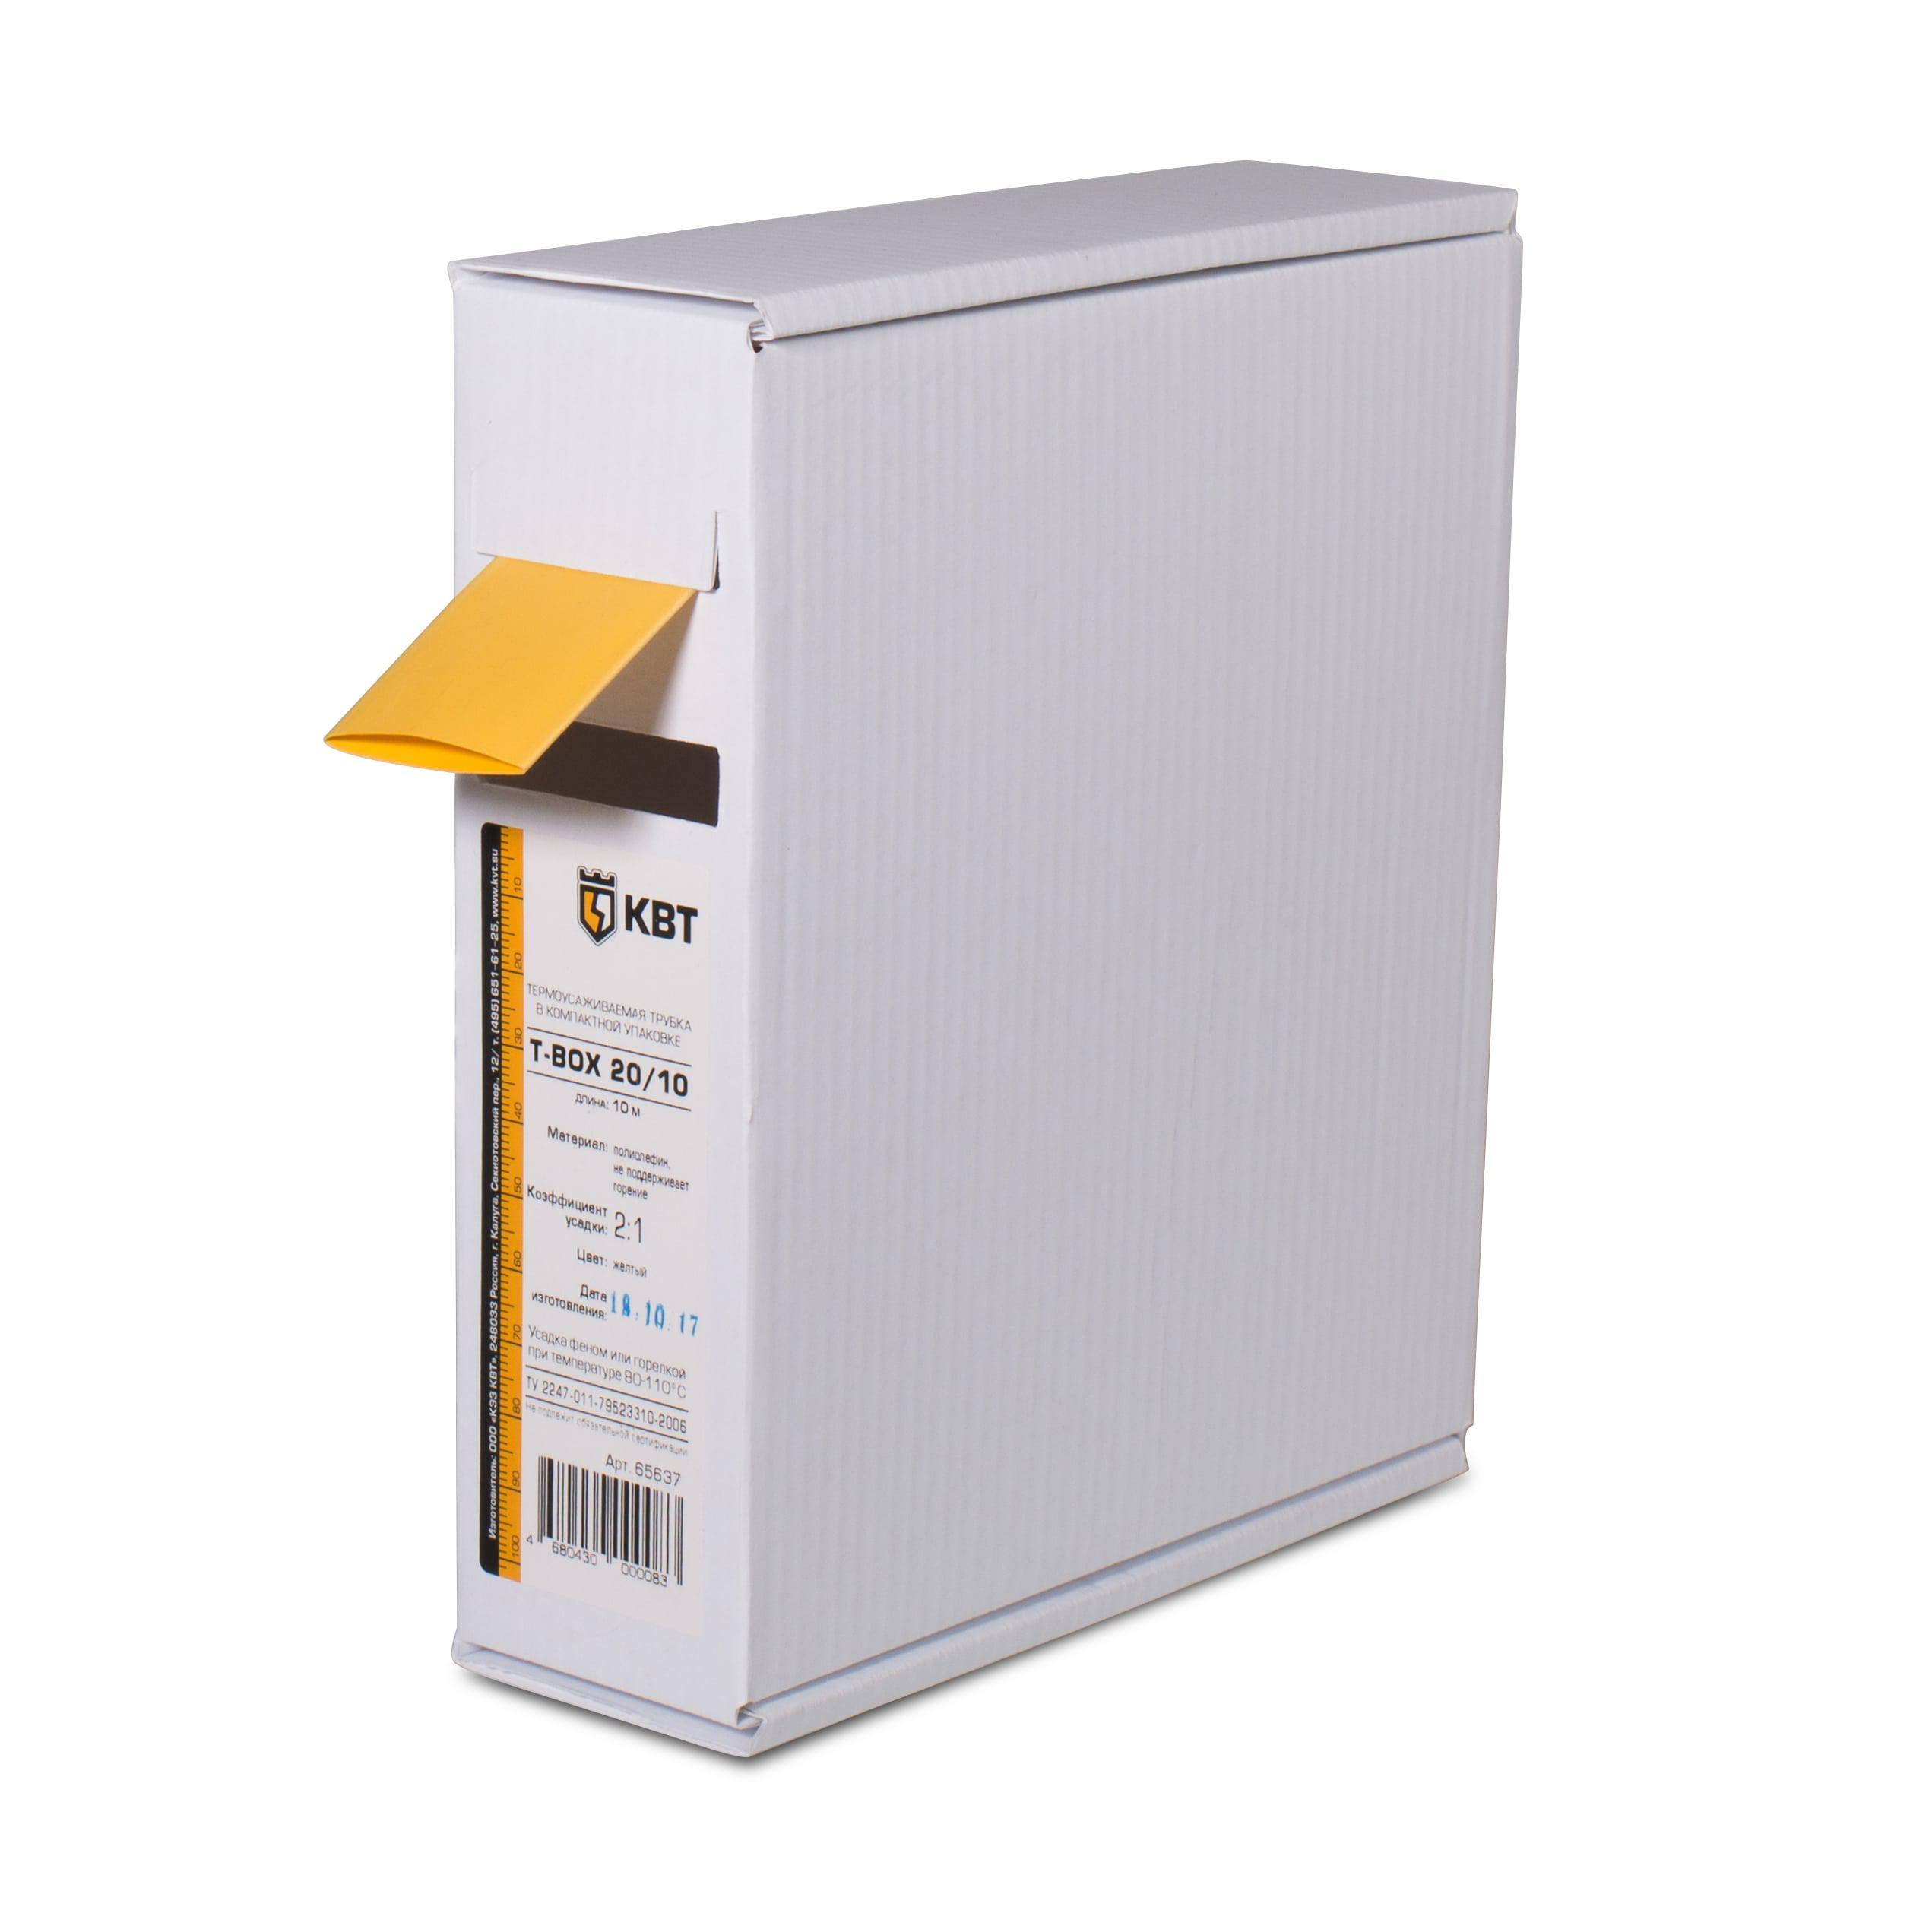 Термоусадочная трубка КВТ Т-box-10/5 желт 10м